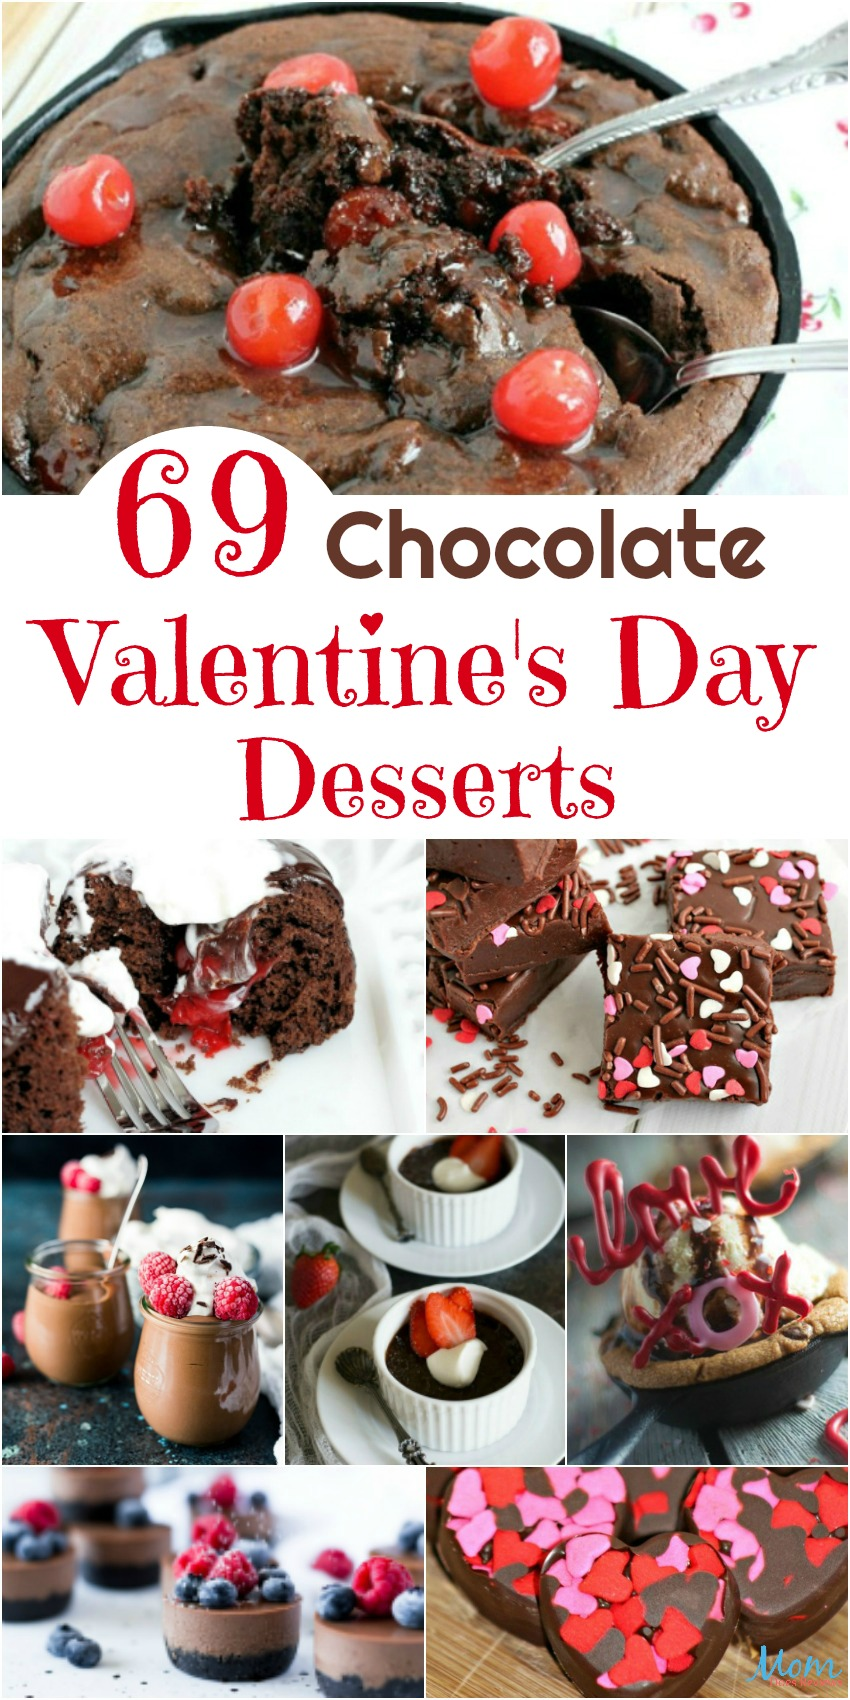 69 Chocolate Valentine's Day Desserts to Sweeten Your Day #Sweet2019  #food #foodie #desserts #chocolate #valentinesday